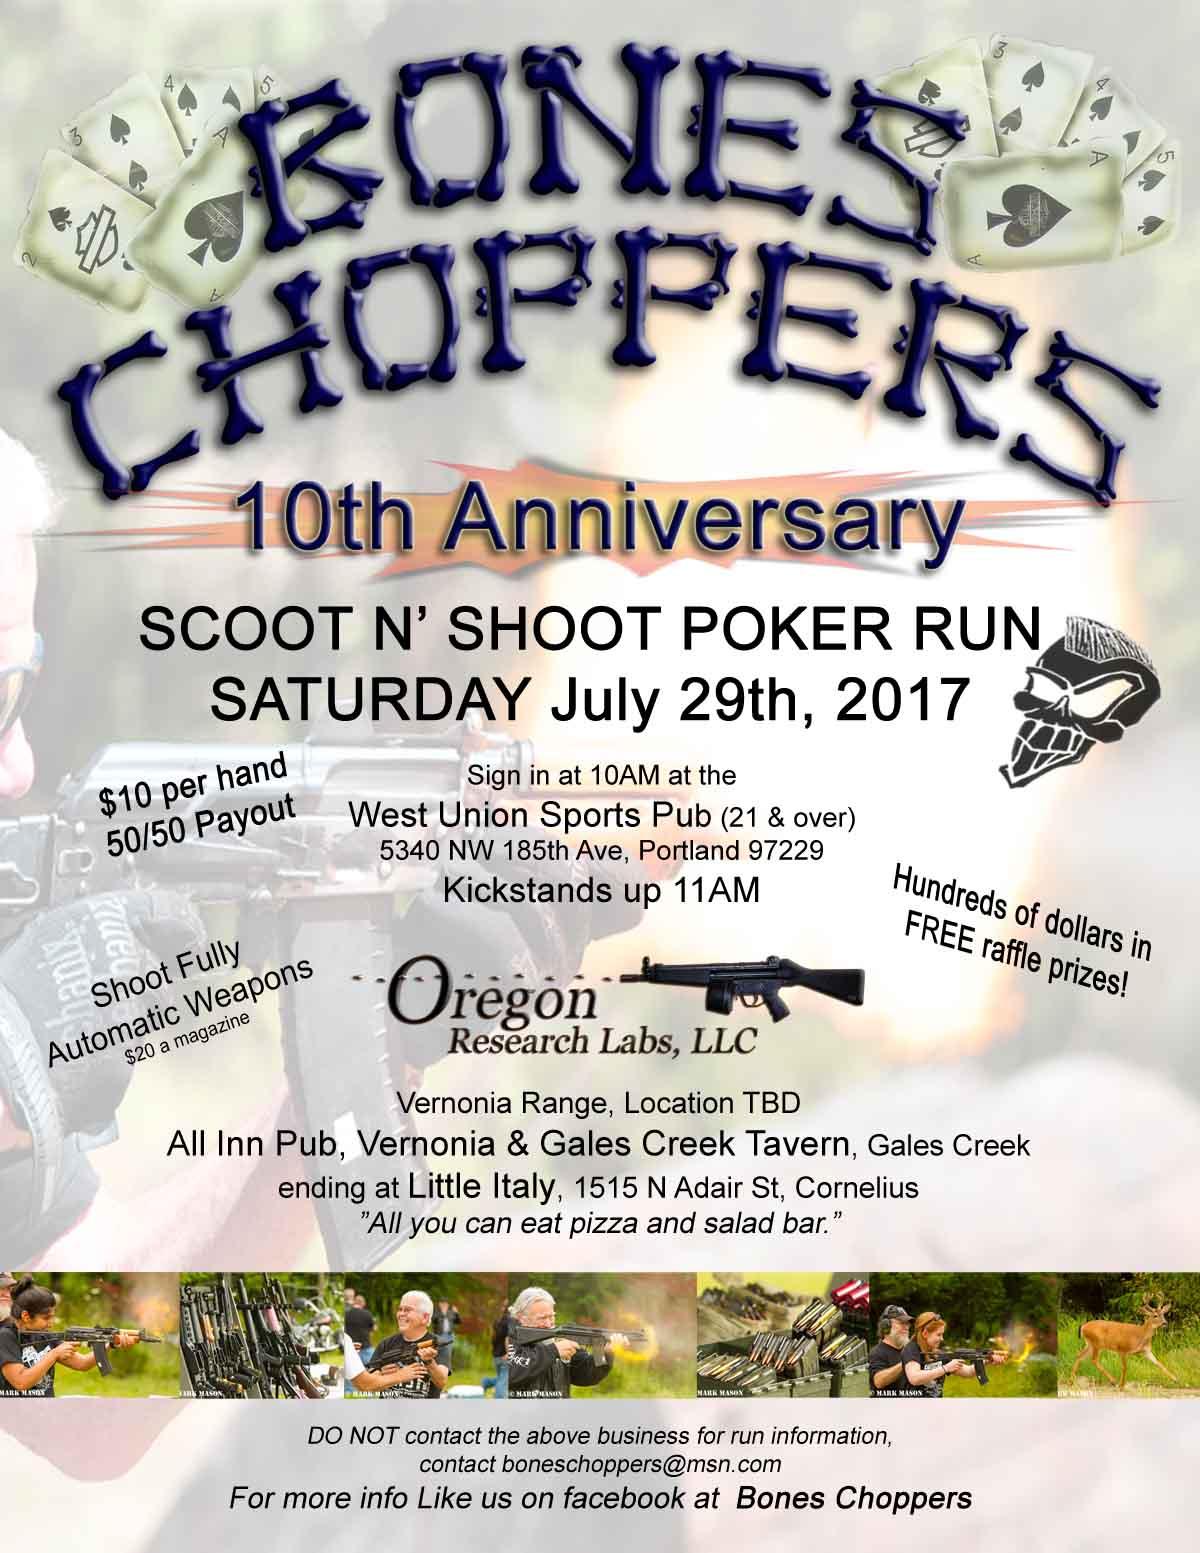 Boneschoppers 10th Anniversary Scoot N Shoot Poker Run